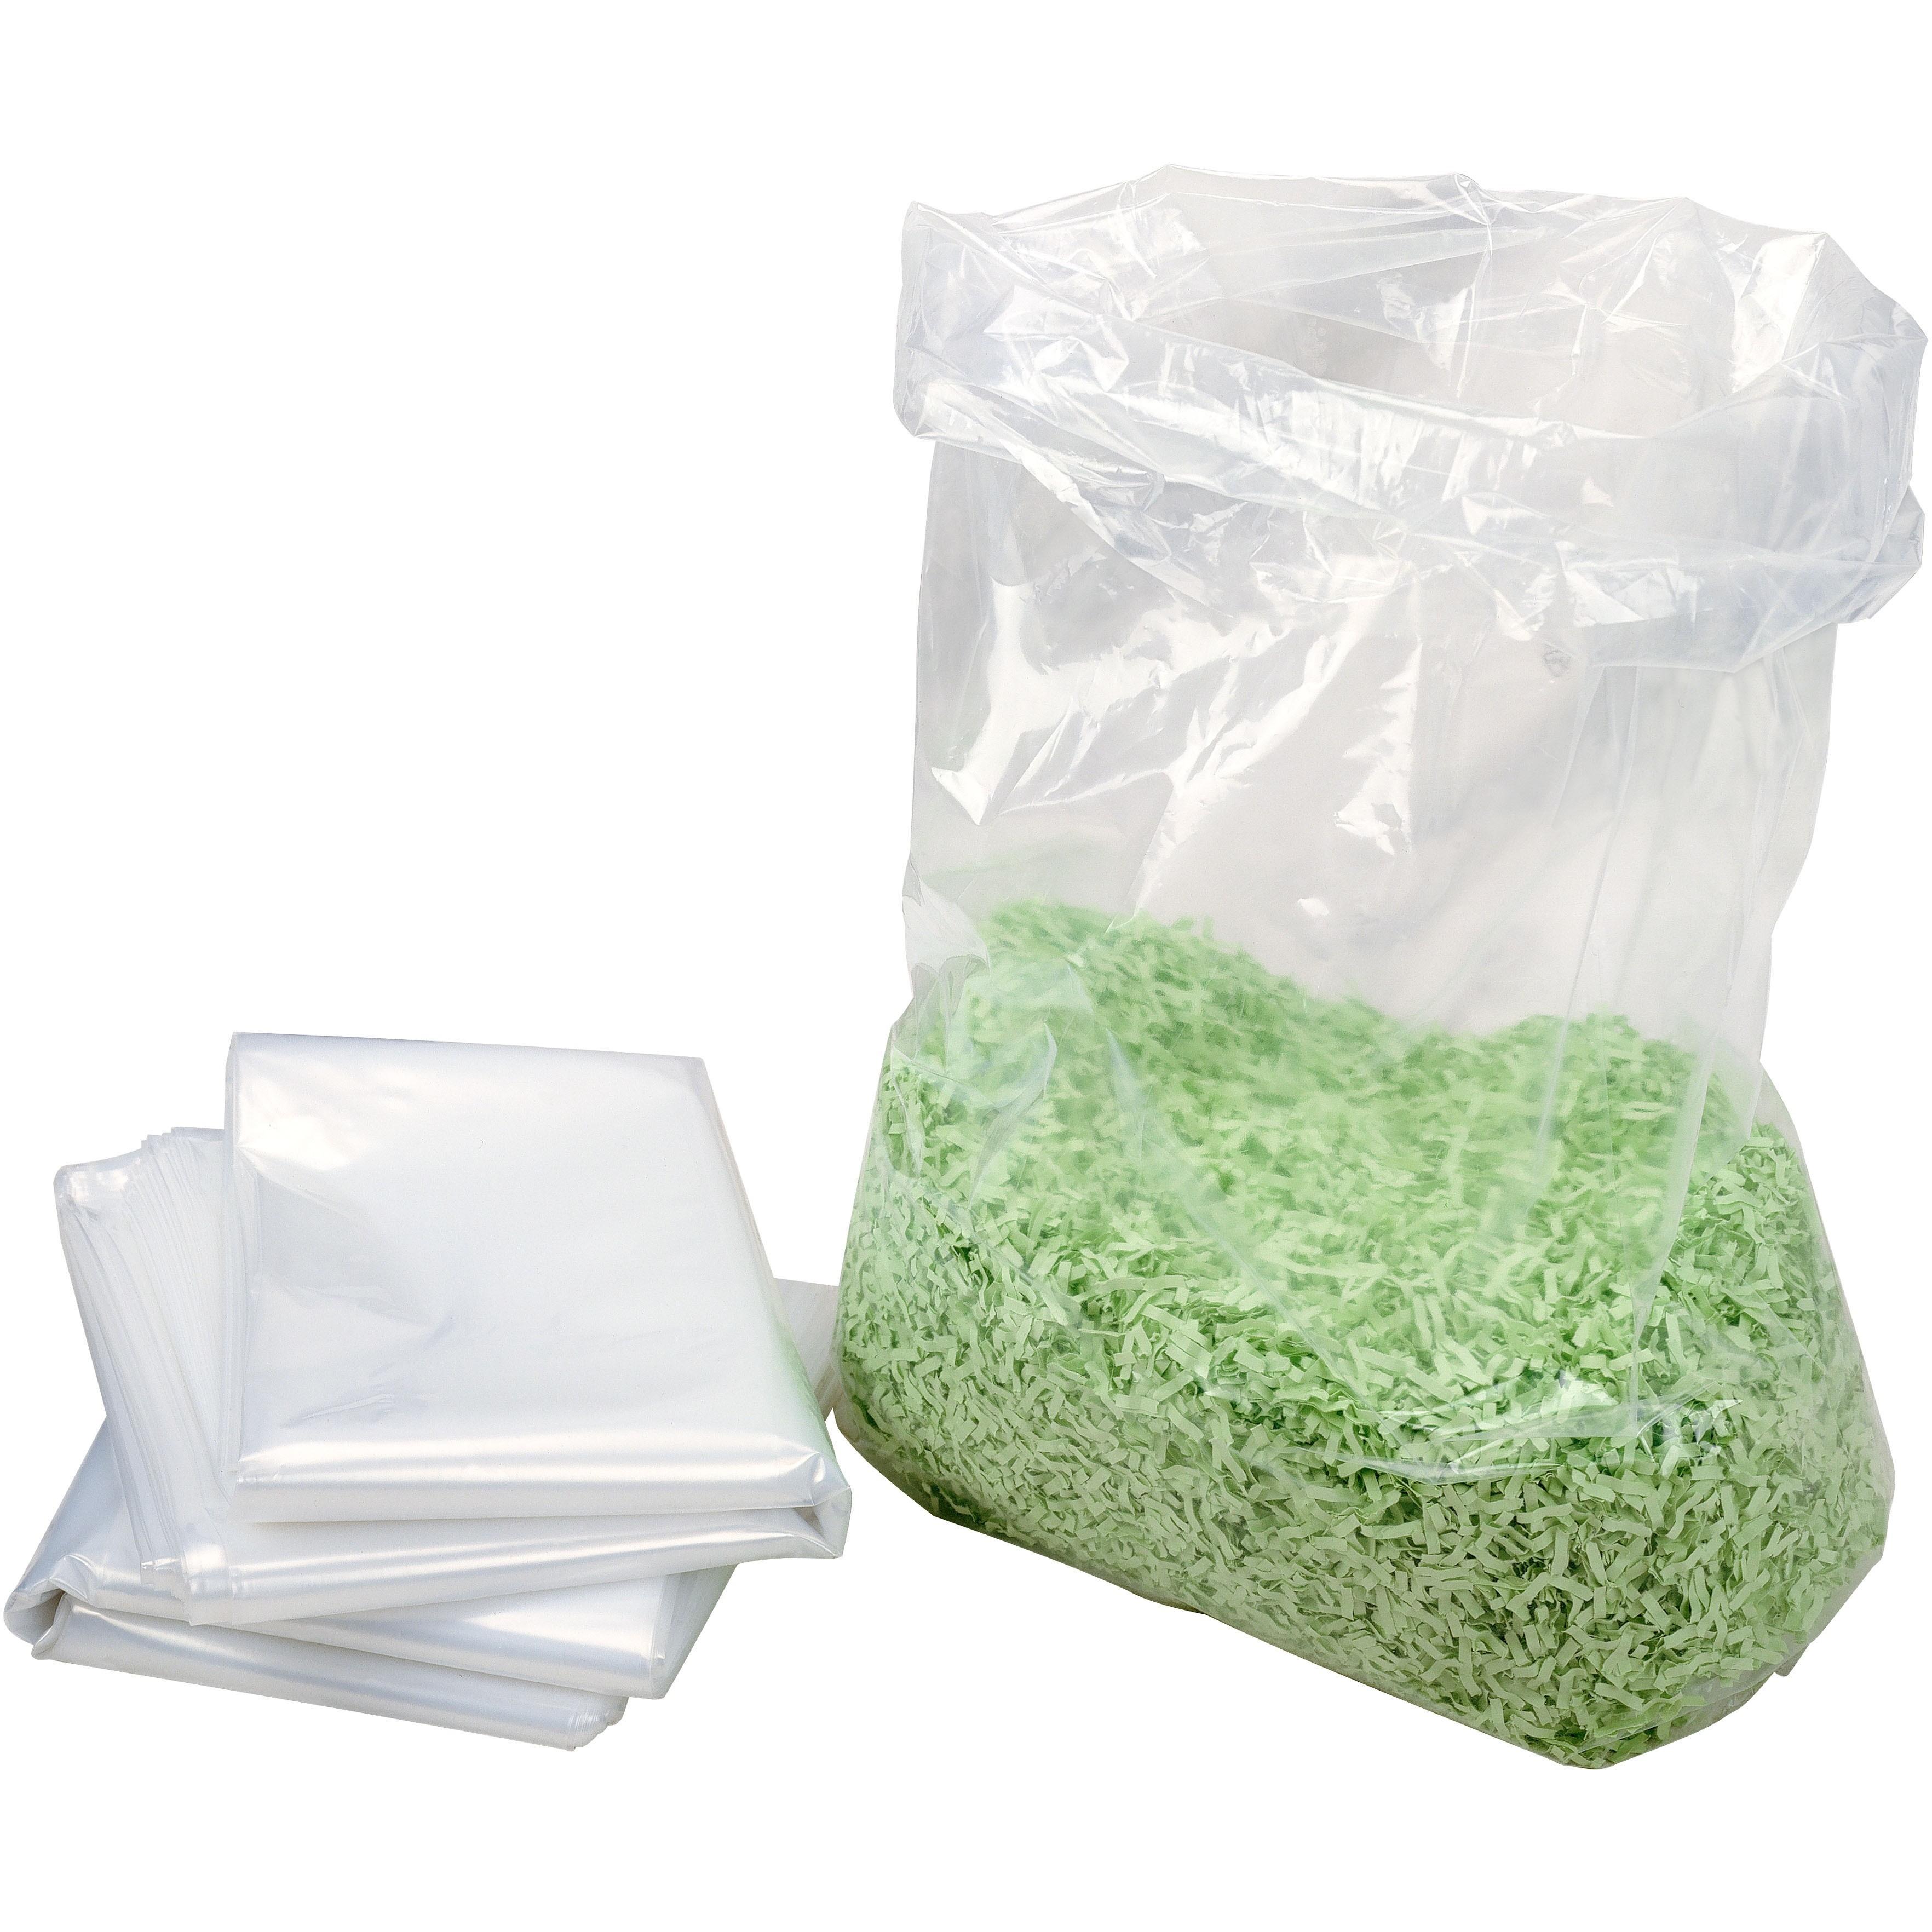 HSM Plastic bags - fits HSM 12 Gigant Baler